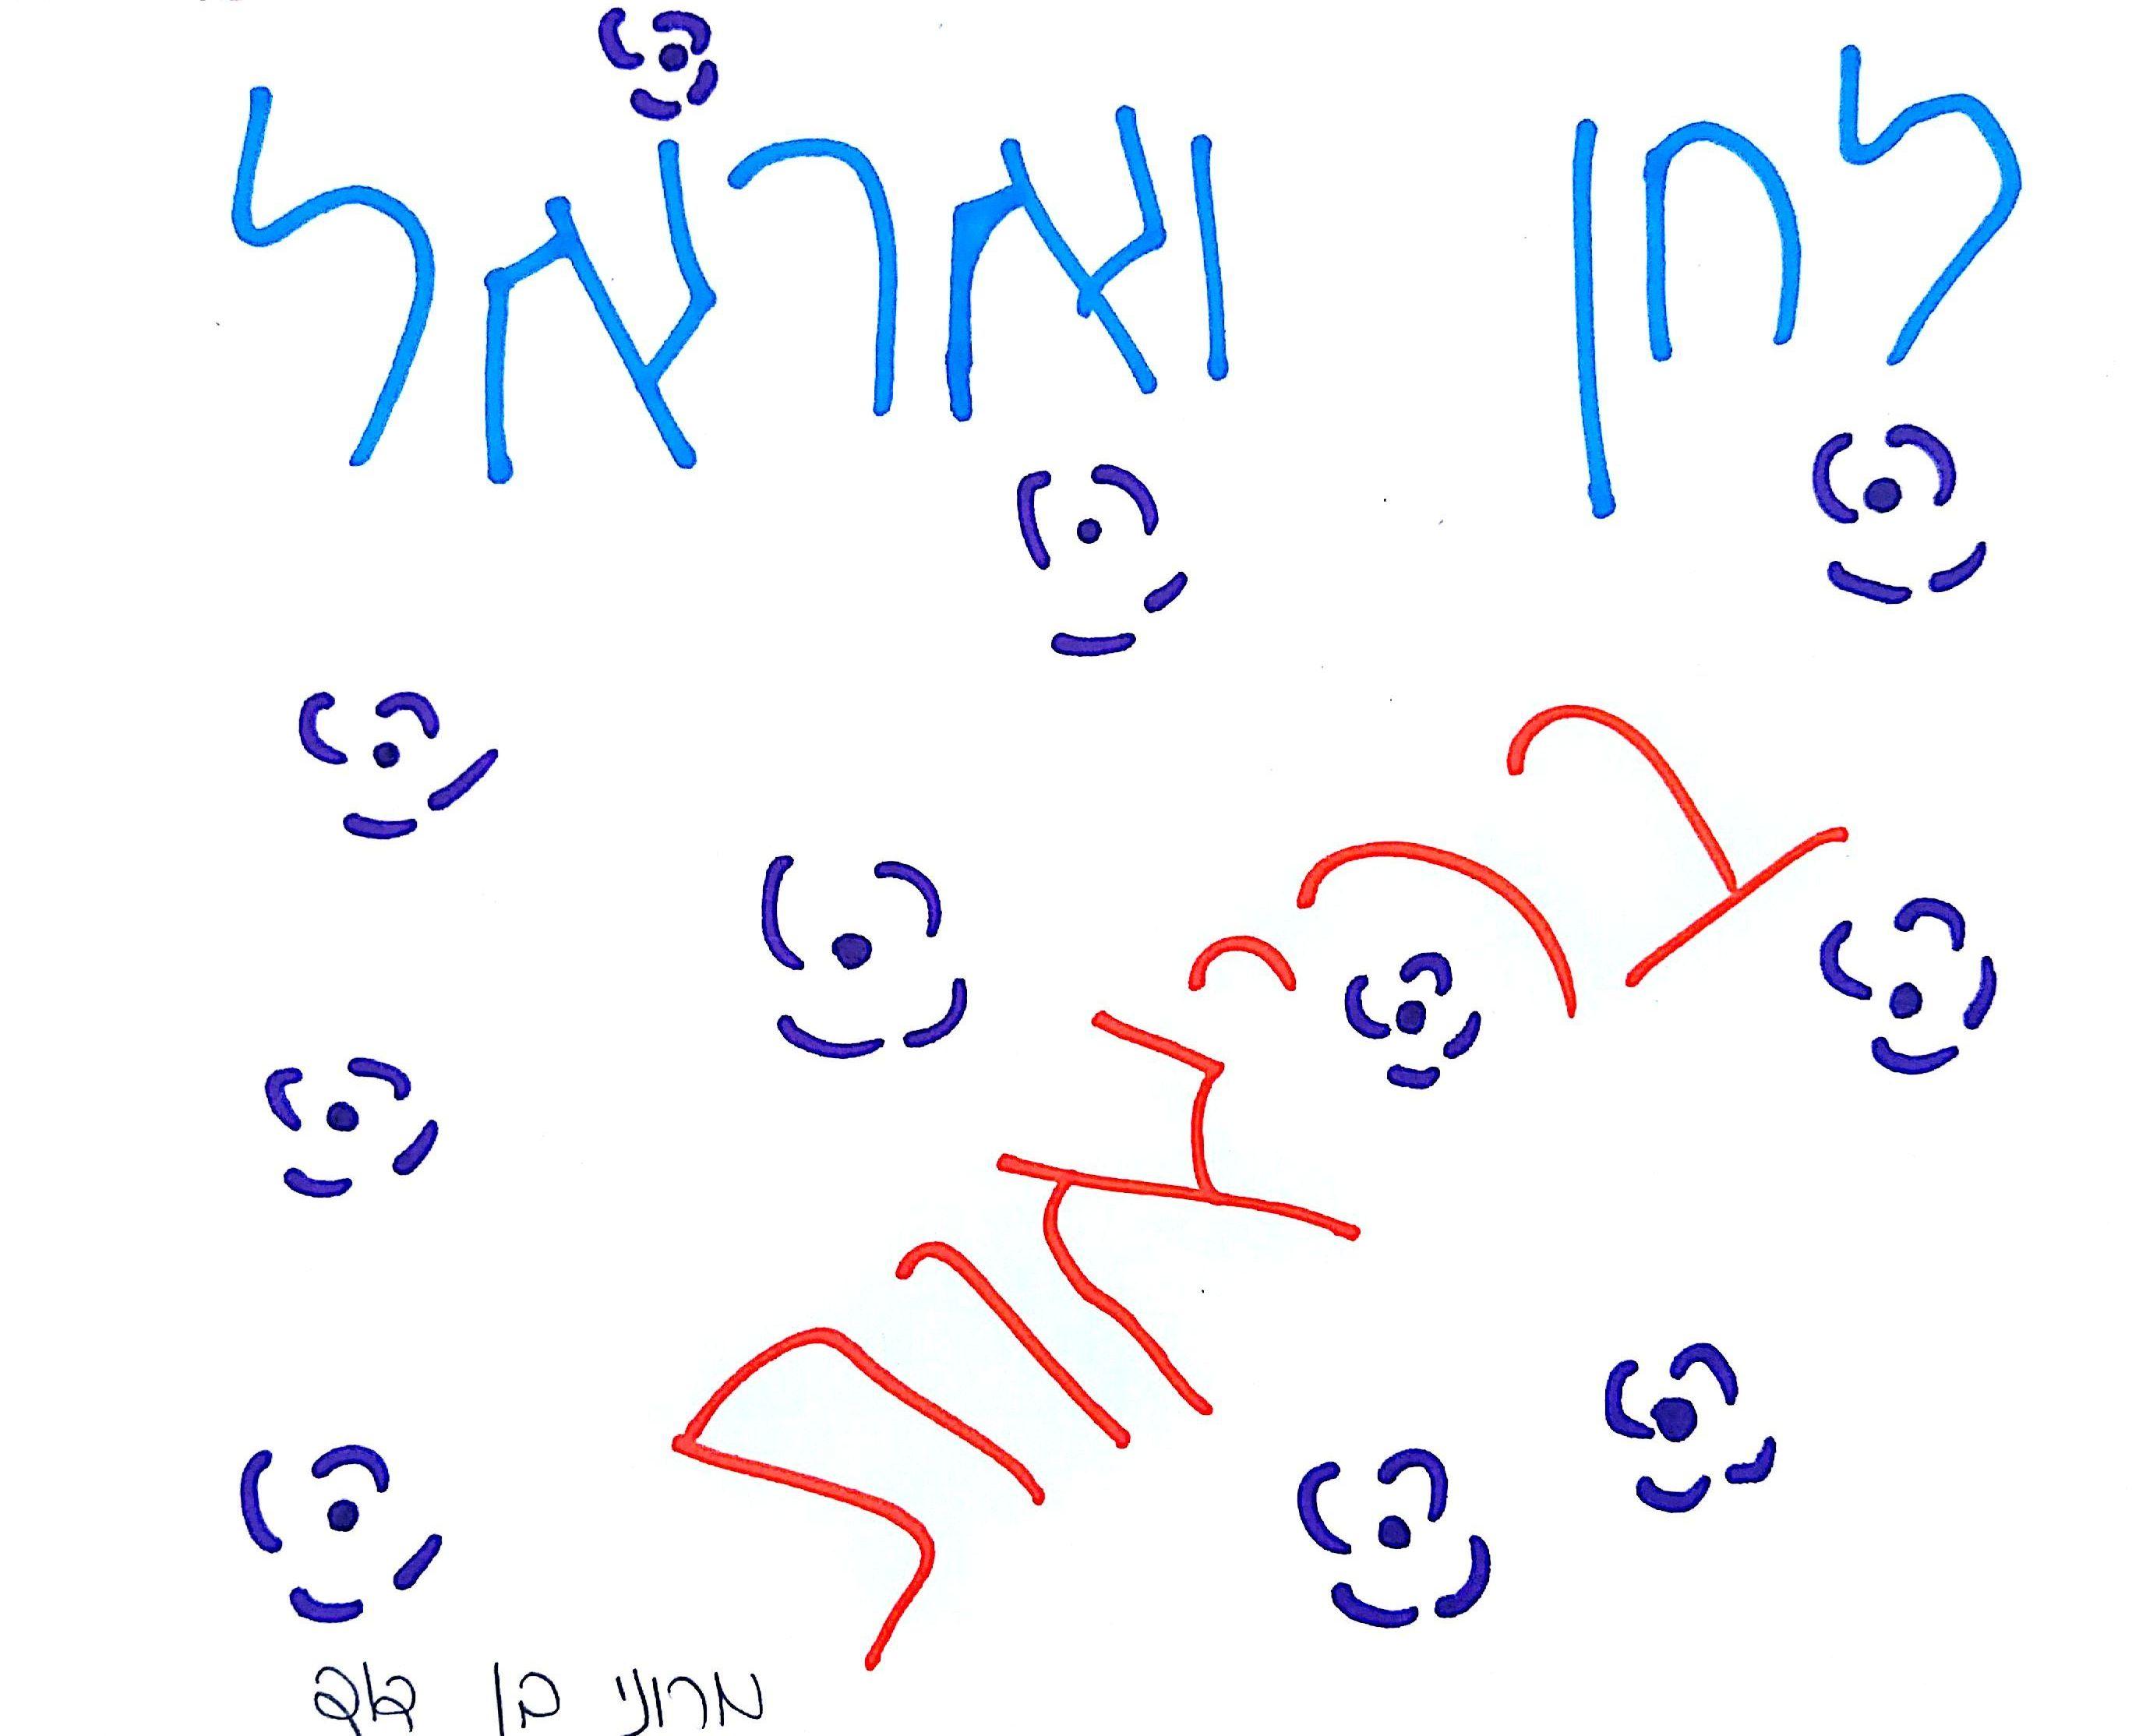 "Artwork from the book - ברכות לחתונה by אילן  - Illustrated by תלמידי כיתה ד' מביה""ס שיזף מברכים את המחנכת שלהם חן - Ourboox.com"